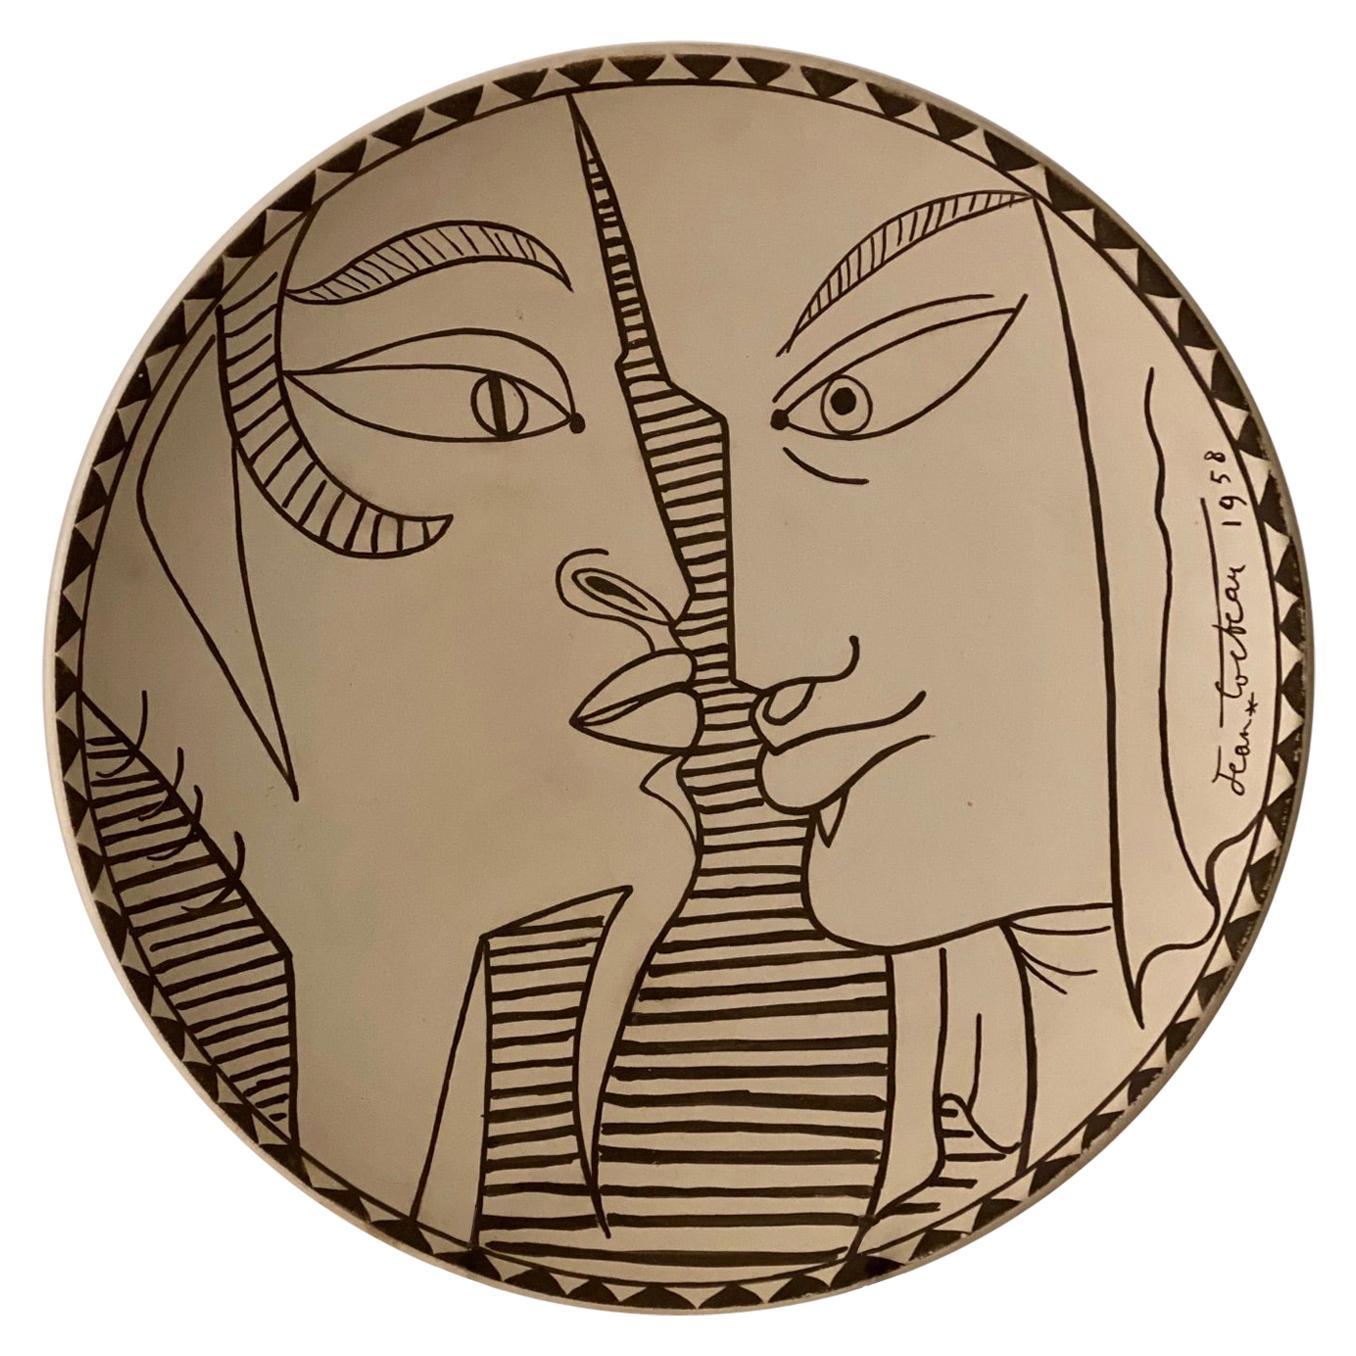 "Jean Cocteau Original Edition Large Ceramic Dish ""Indes"", 1958"